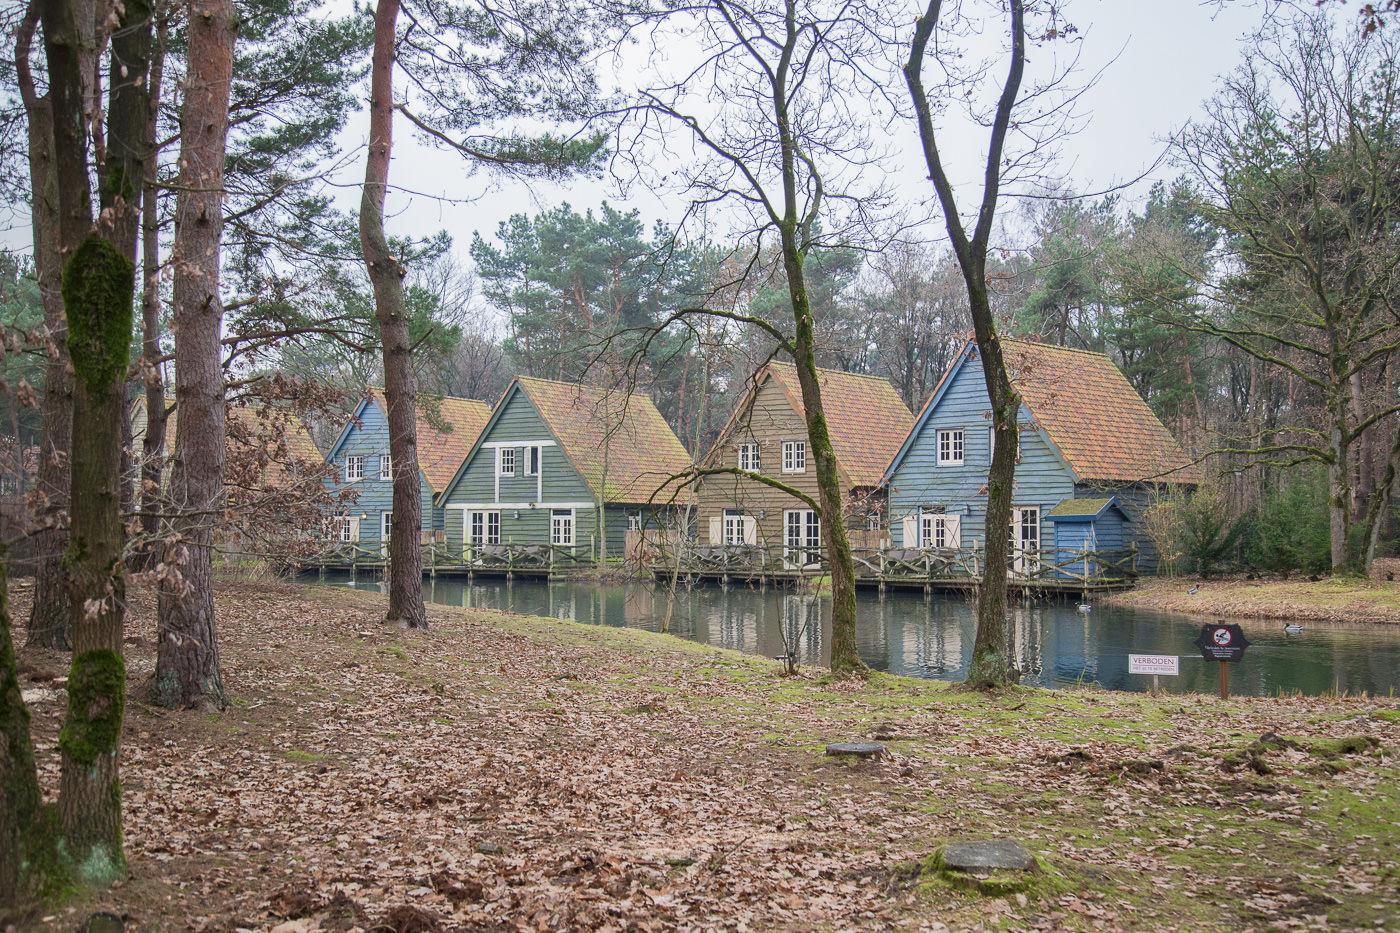 bosrijk Ferienhäuser am See